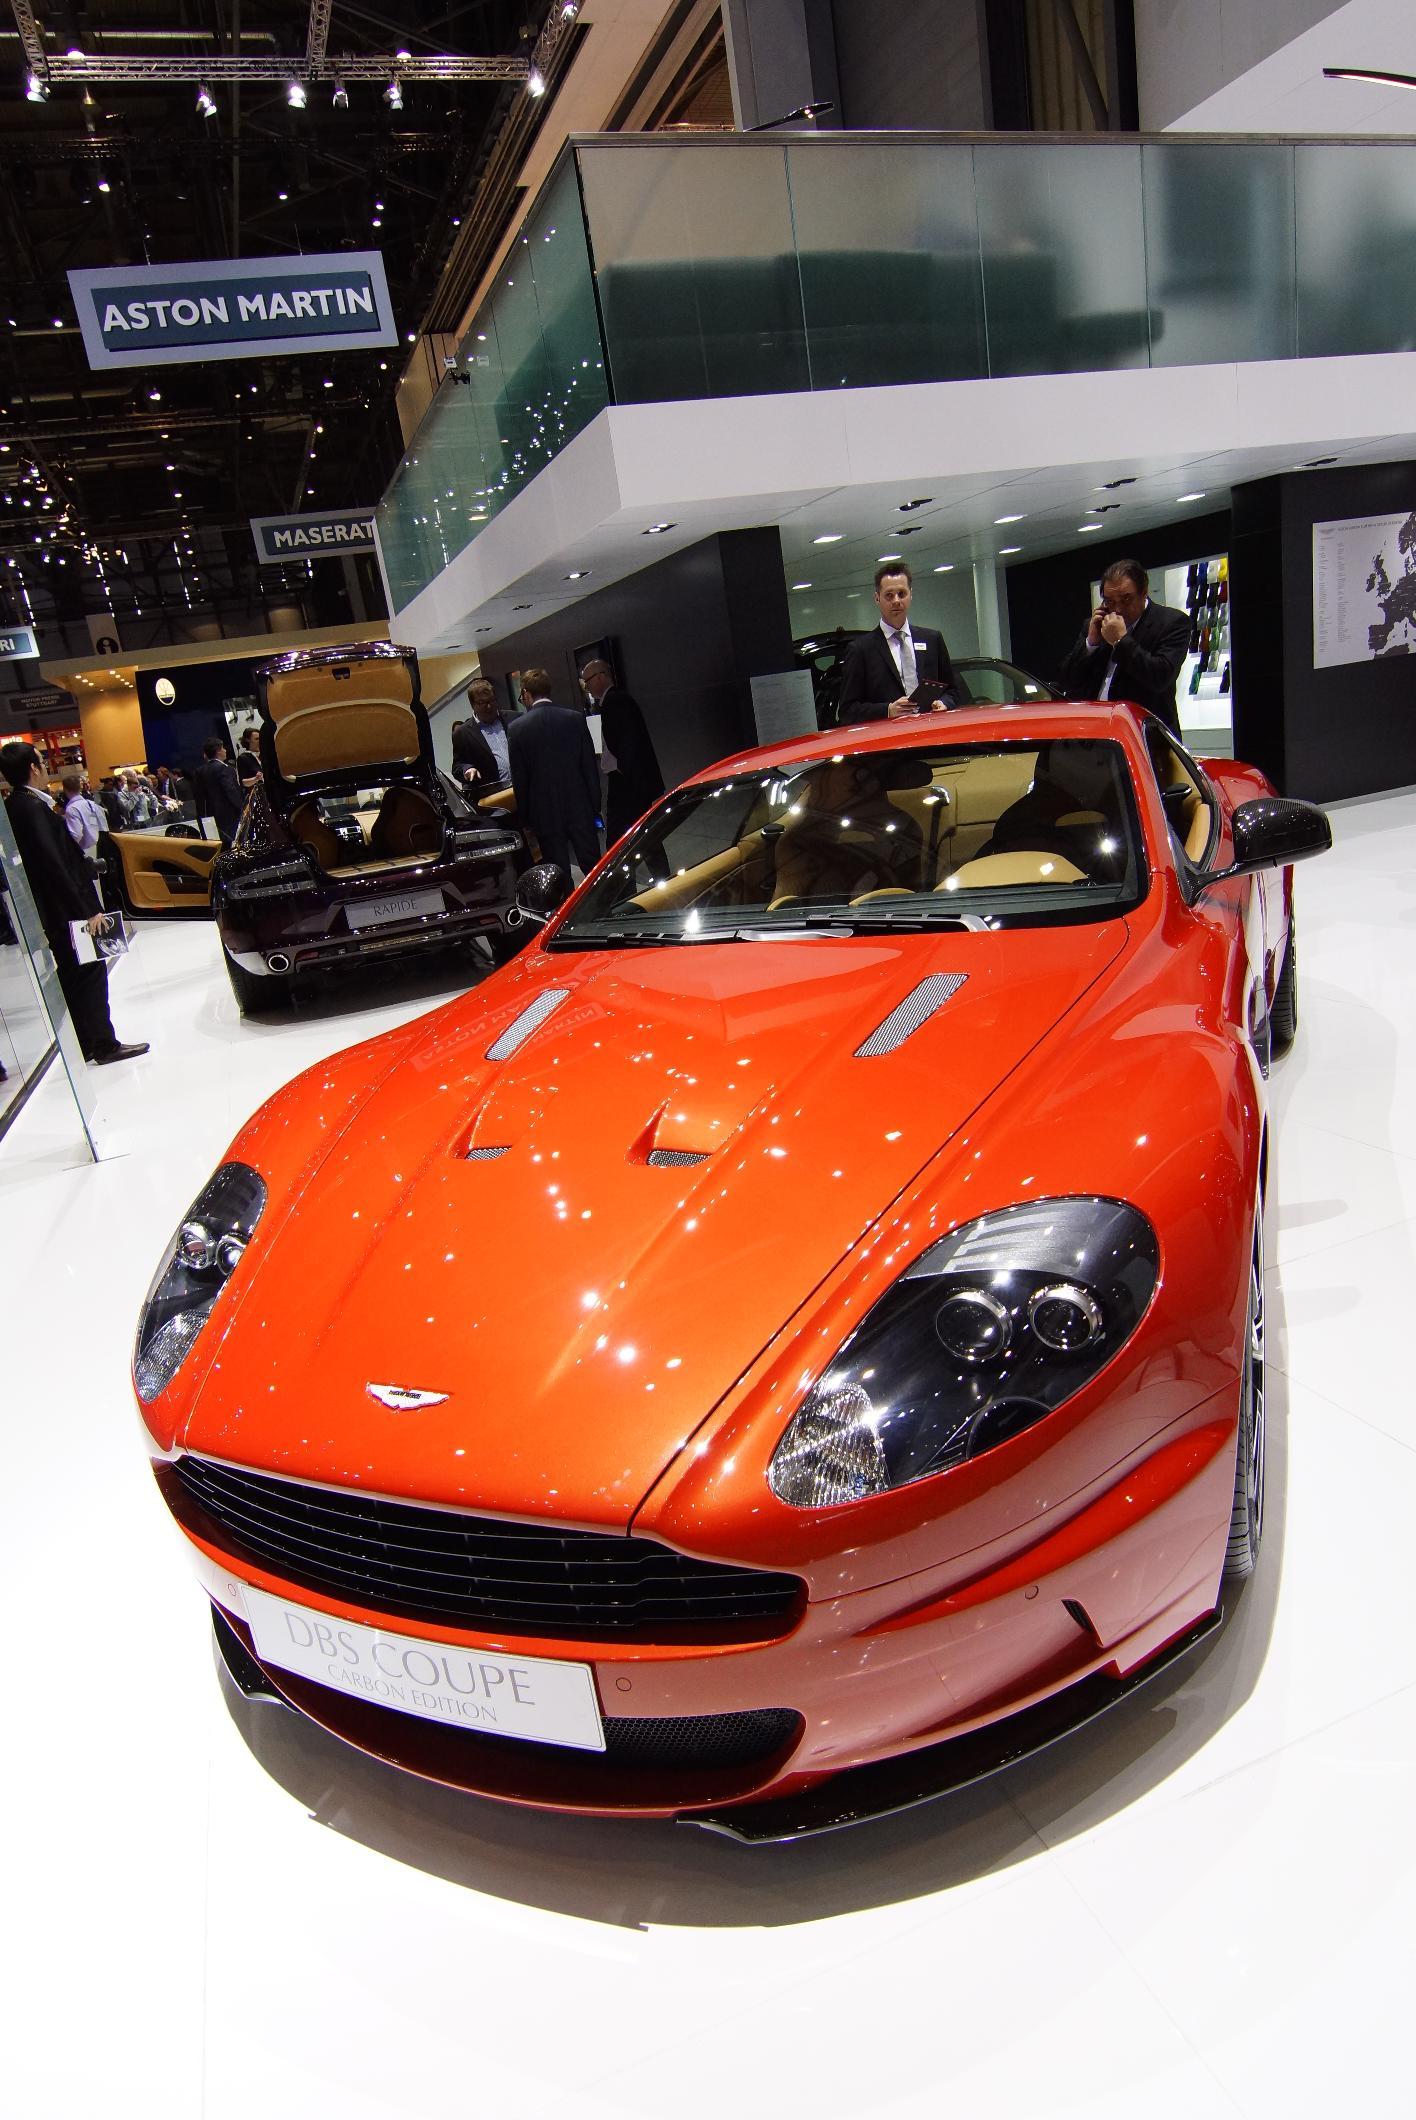 Aston Martin DBS Carbon Edition Geneva 2012 Front